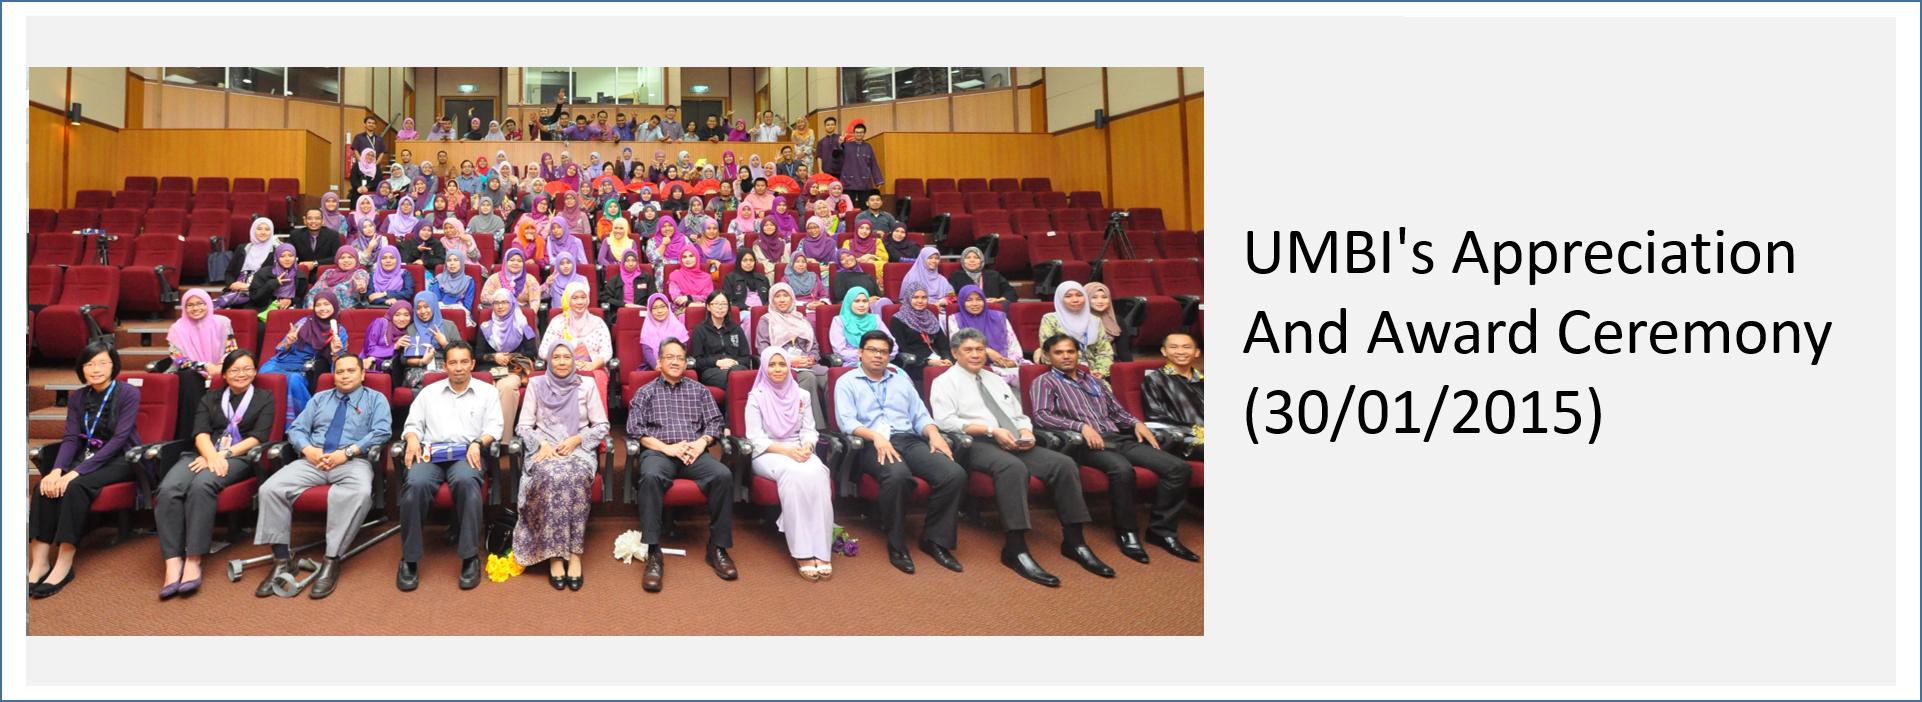 UMBI's Appreciation And Award Ceremony